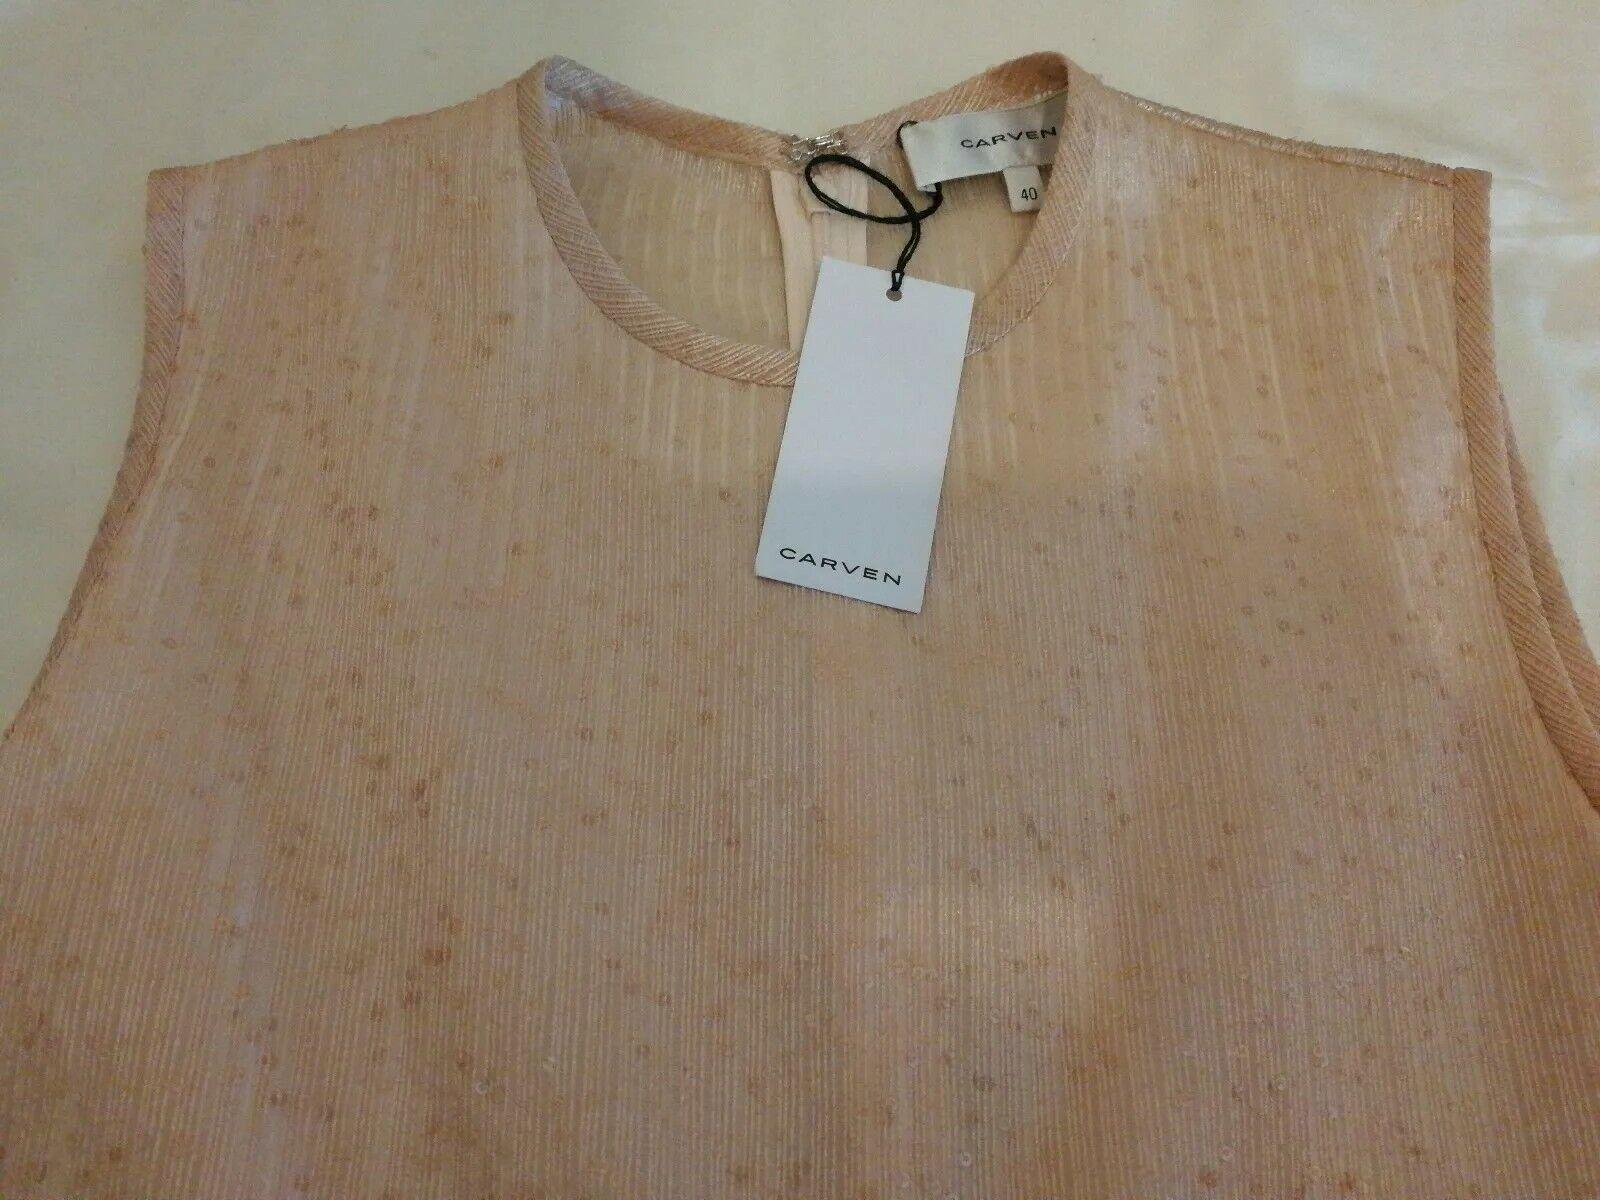 Carven Robe Robe Robe Baby Doll Dress Nude Pink ITA 44 3f186e